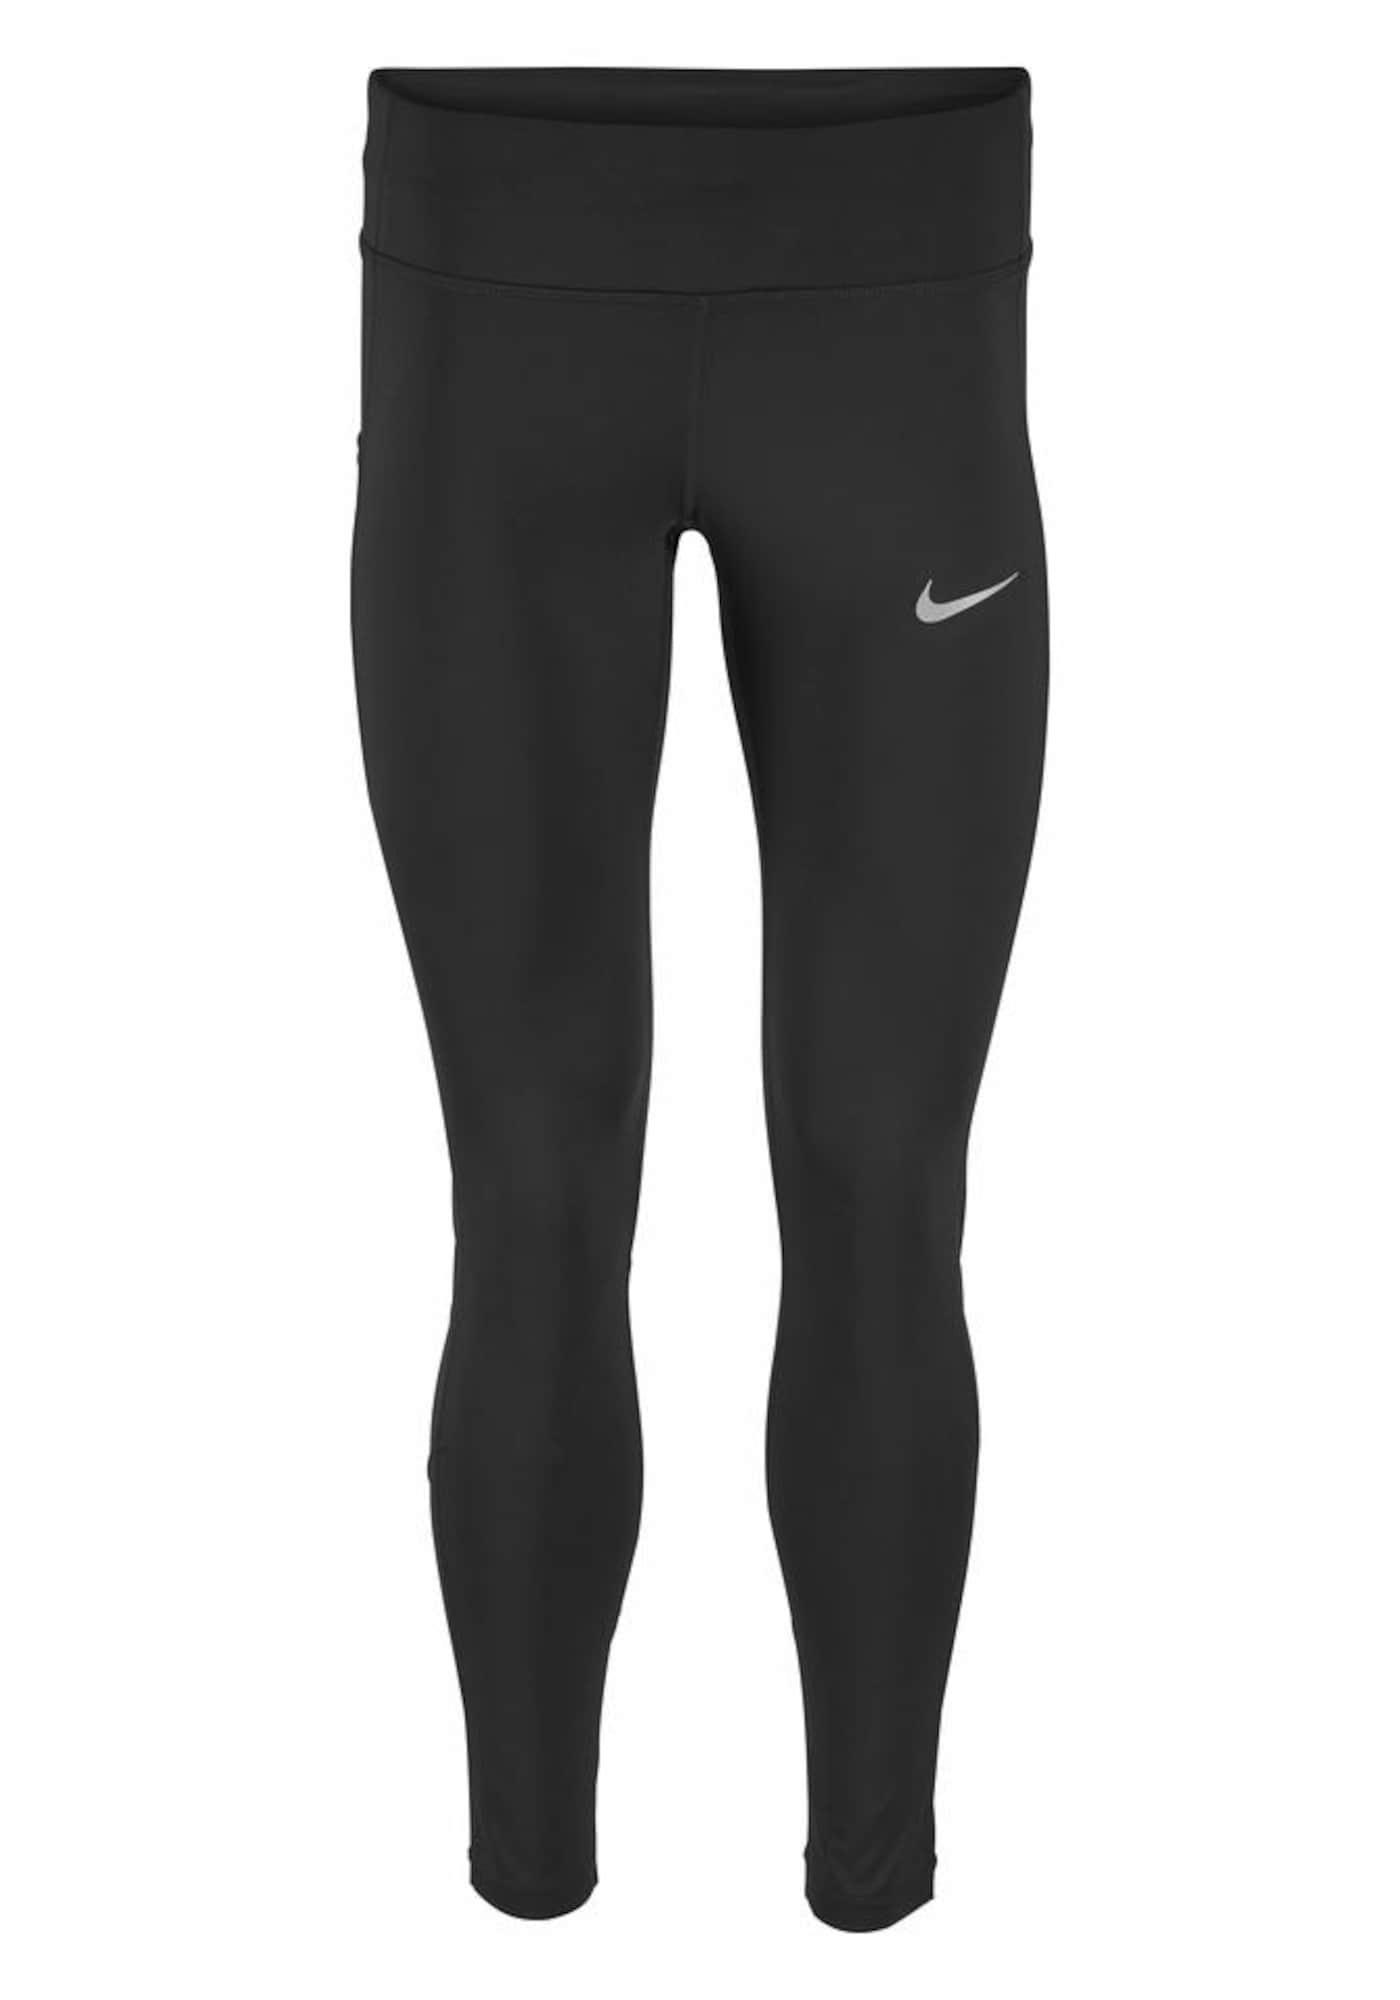 NIKE Športové nohavice 'POWER TIGHT RACER'  čierna